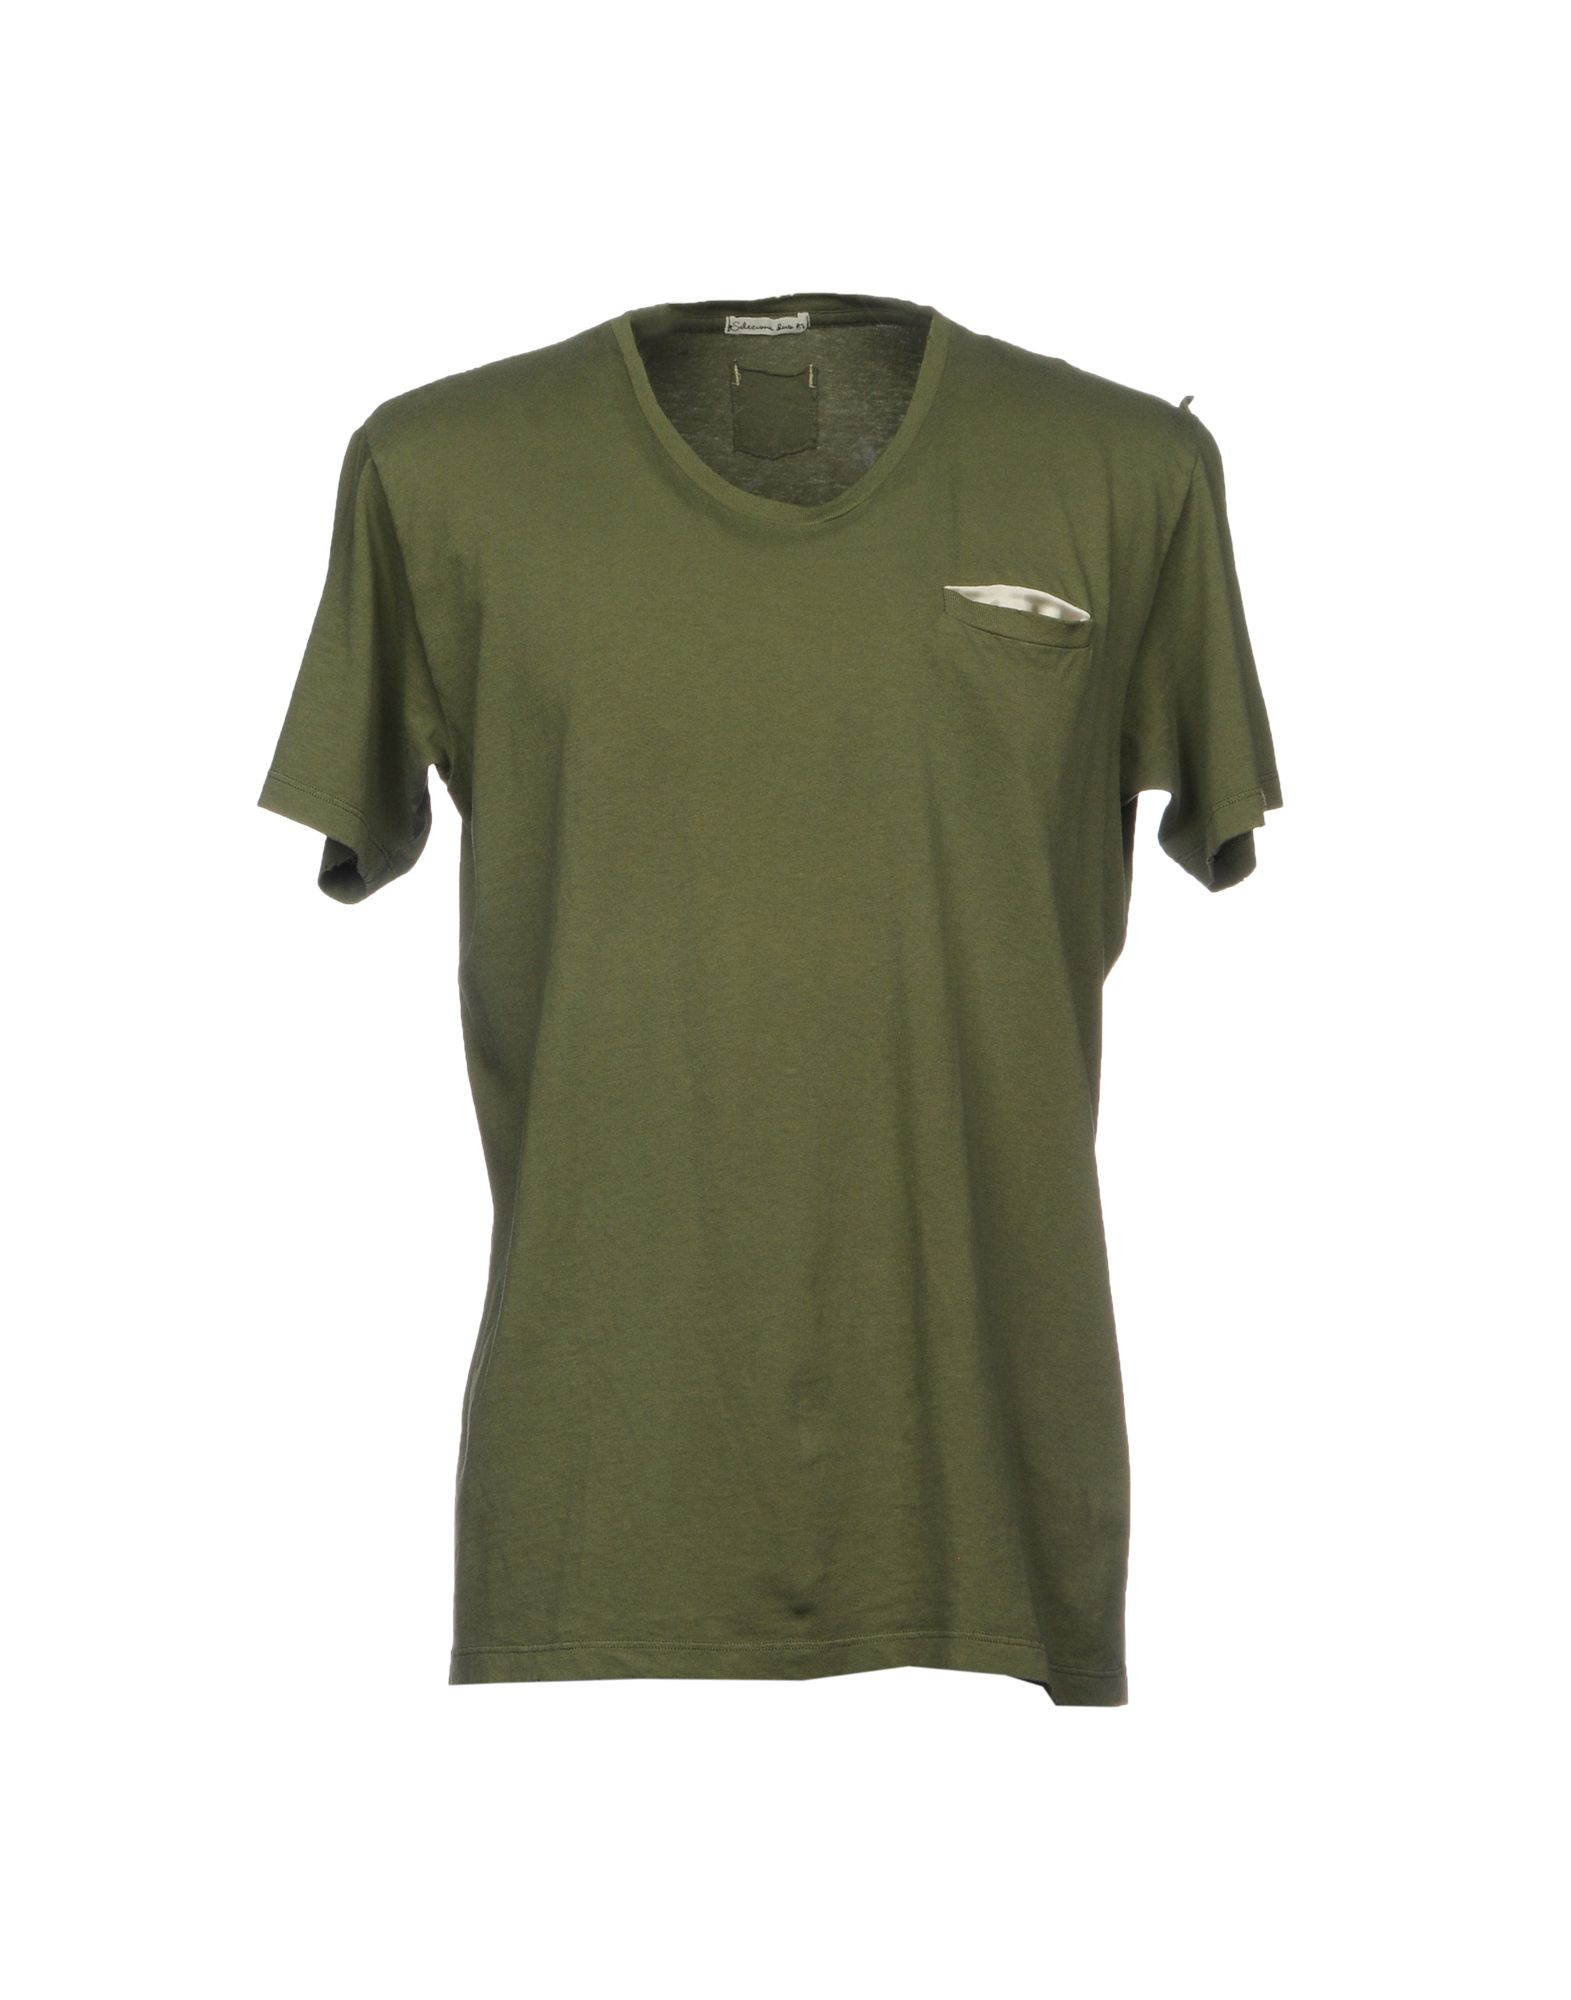 T-Shirt Selezione Selezione T-Shirt Dus 81' Uomo - 12089316QW 1ed900